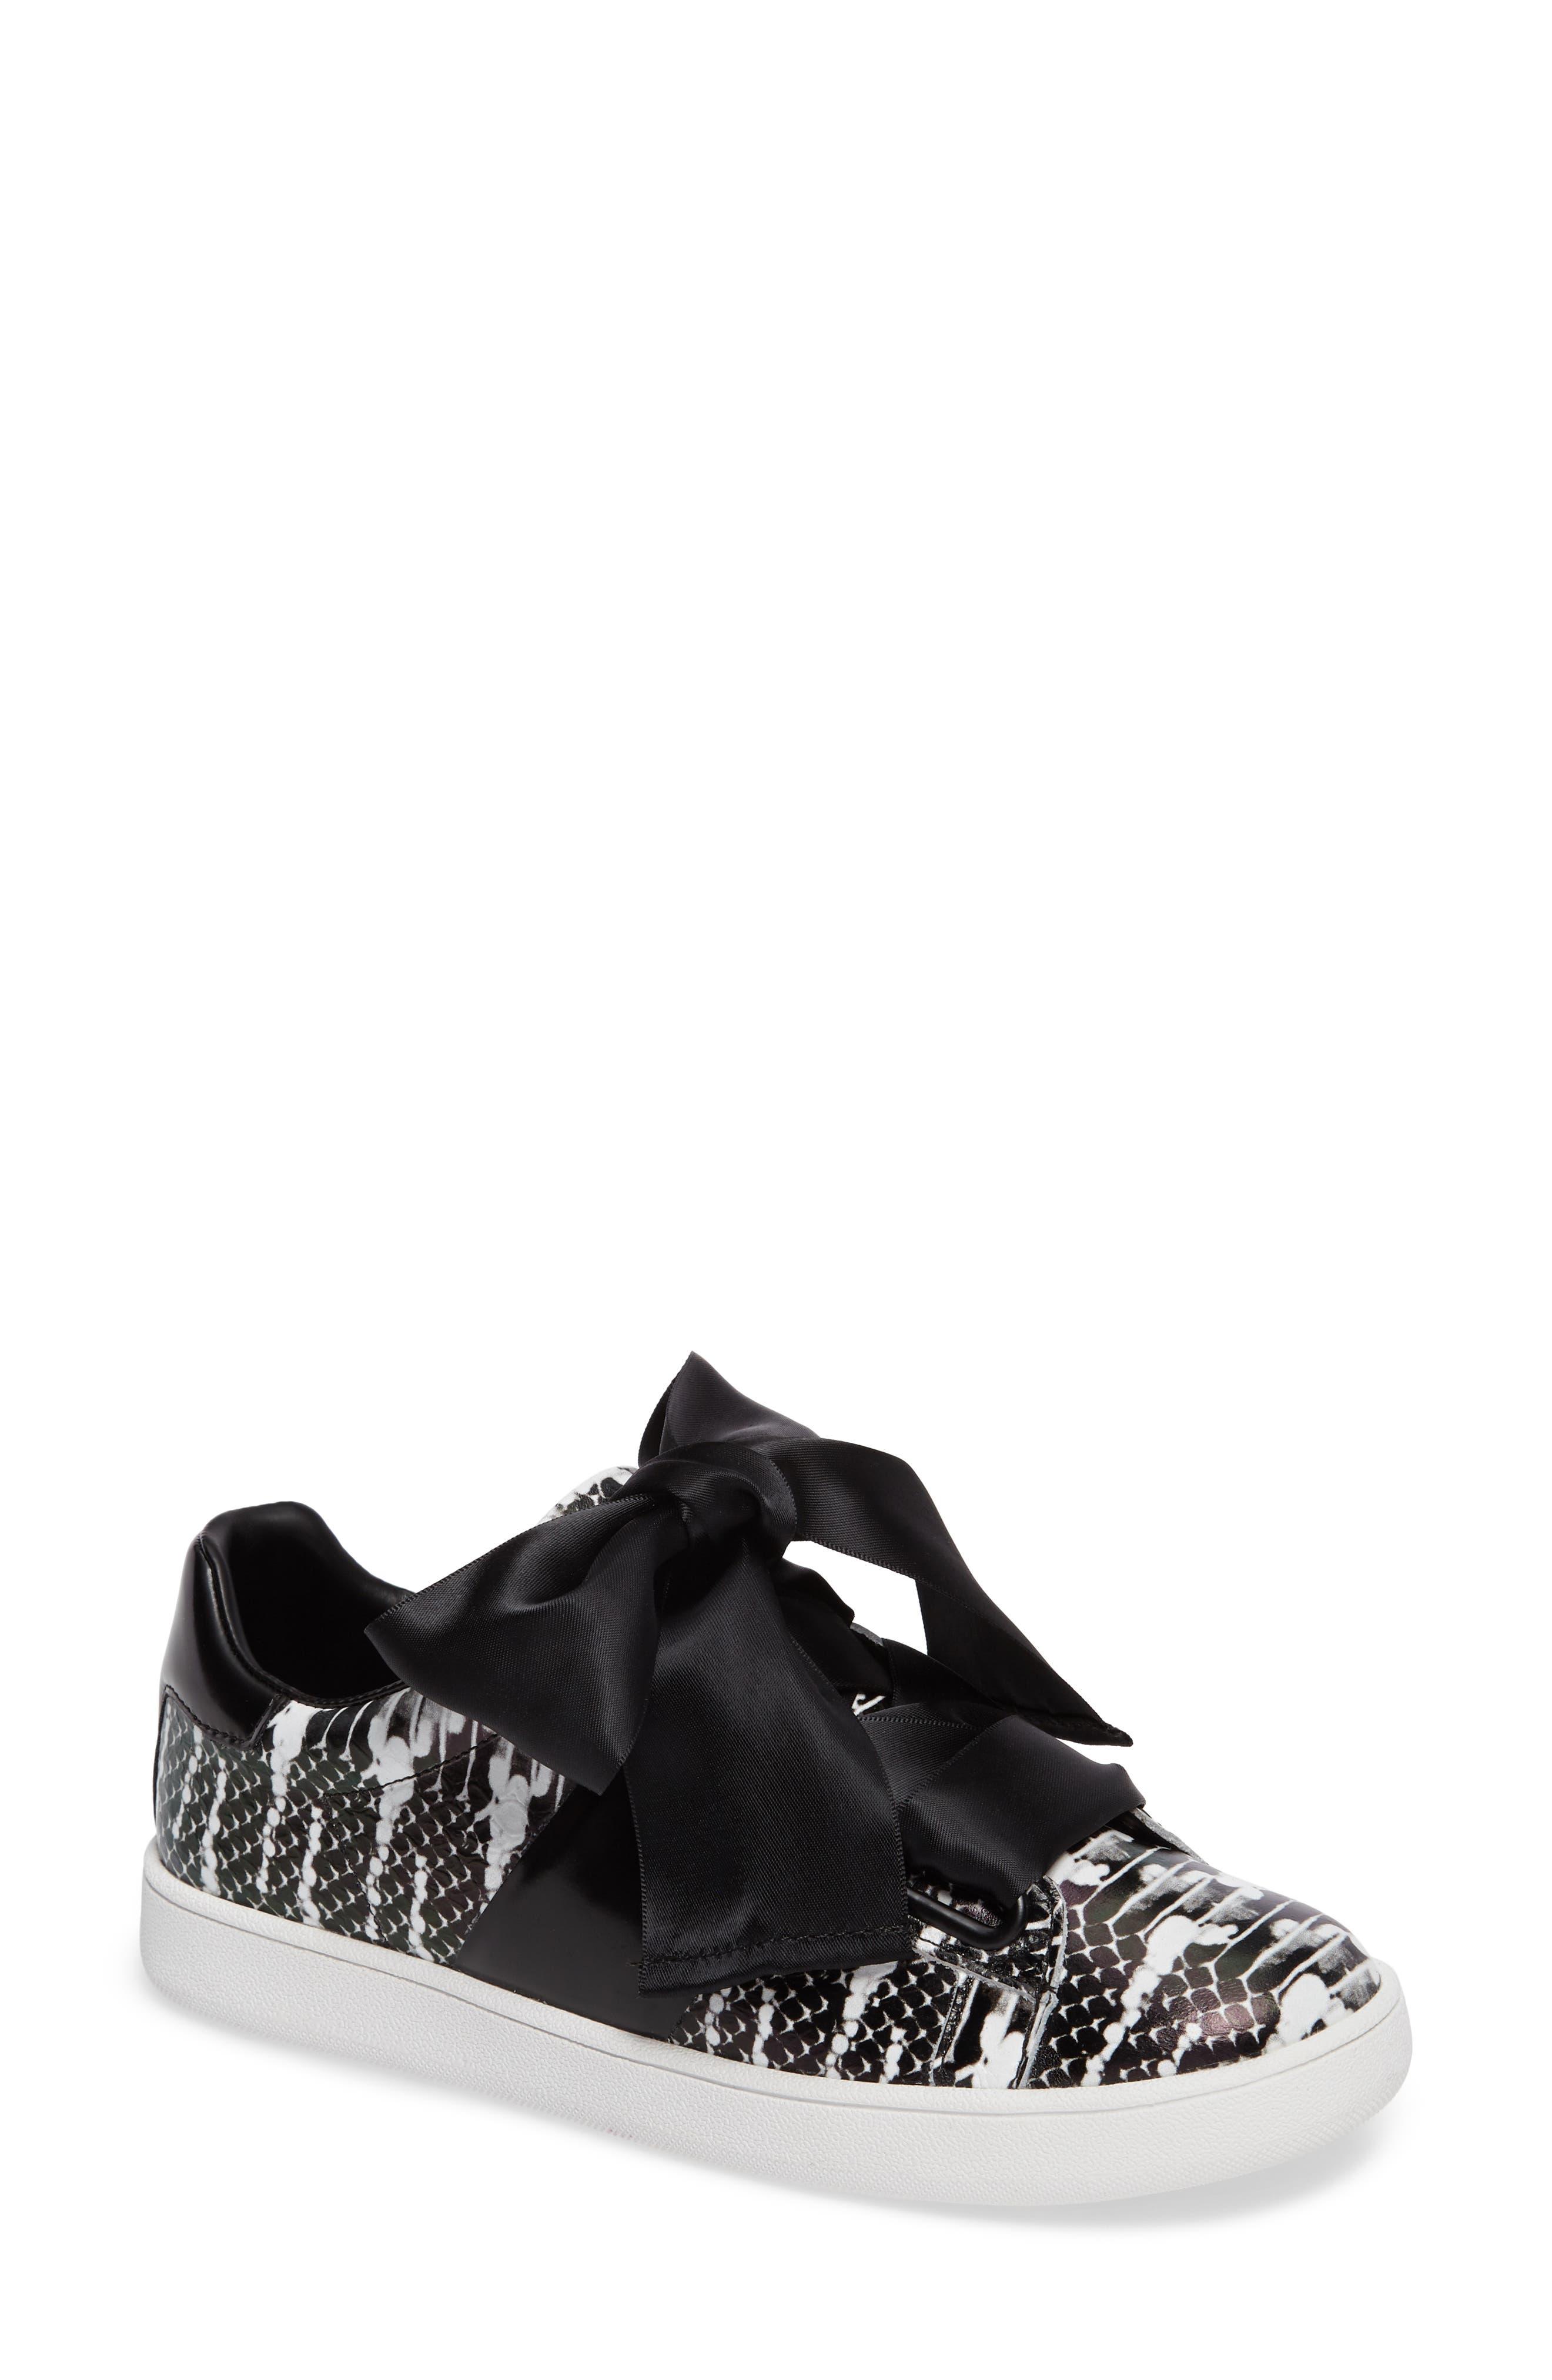 Pabst Low-Top Sneaker,                             Main thumbnail 10, color,